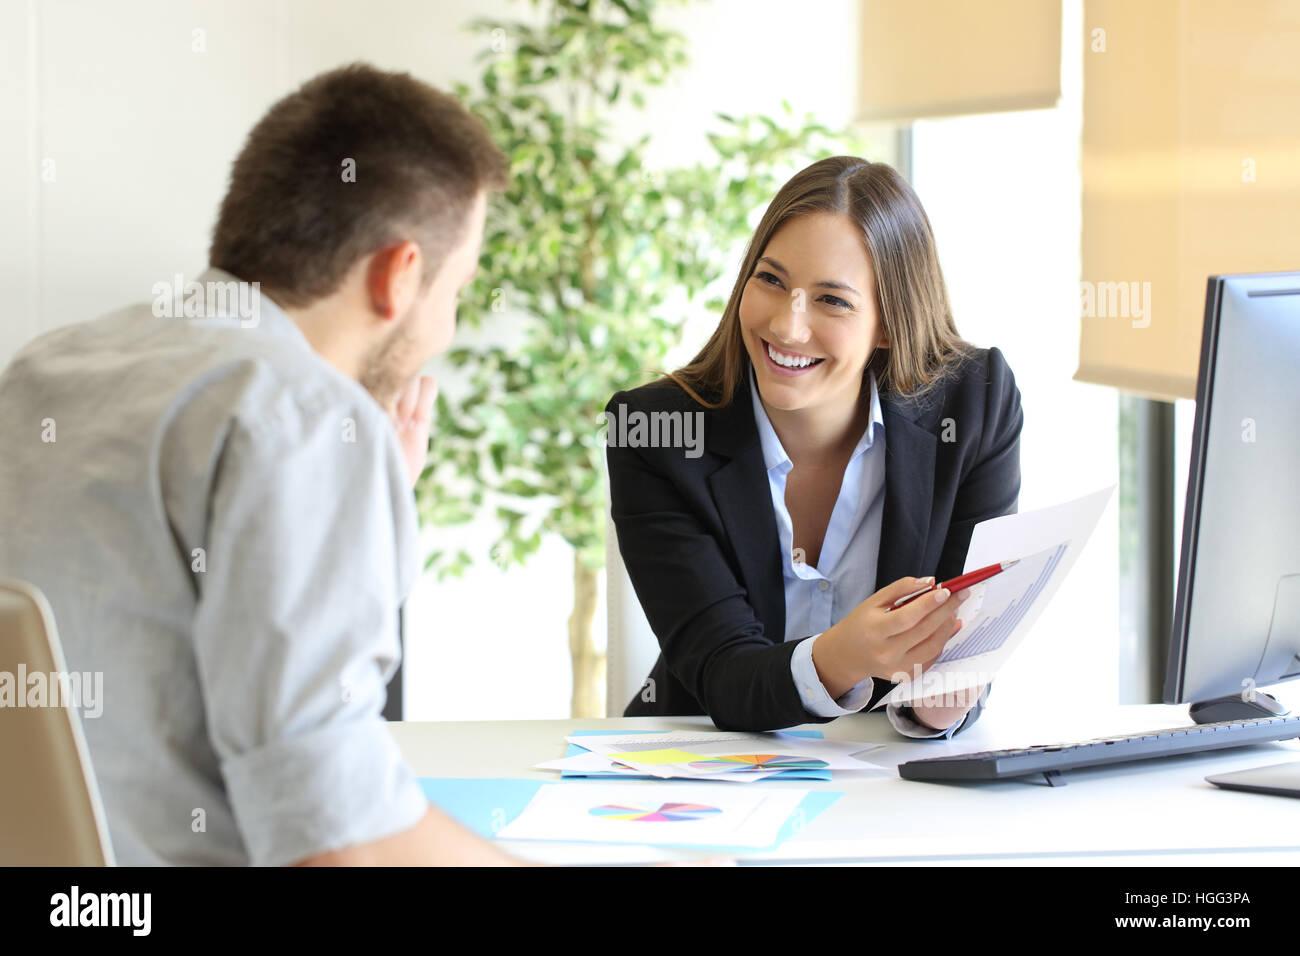 Boss showing a good job congratulating an employee at office - Stock Image